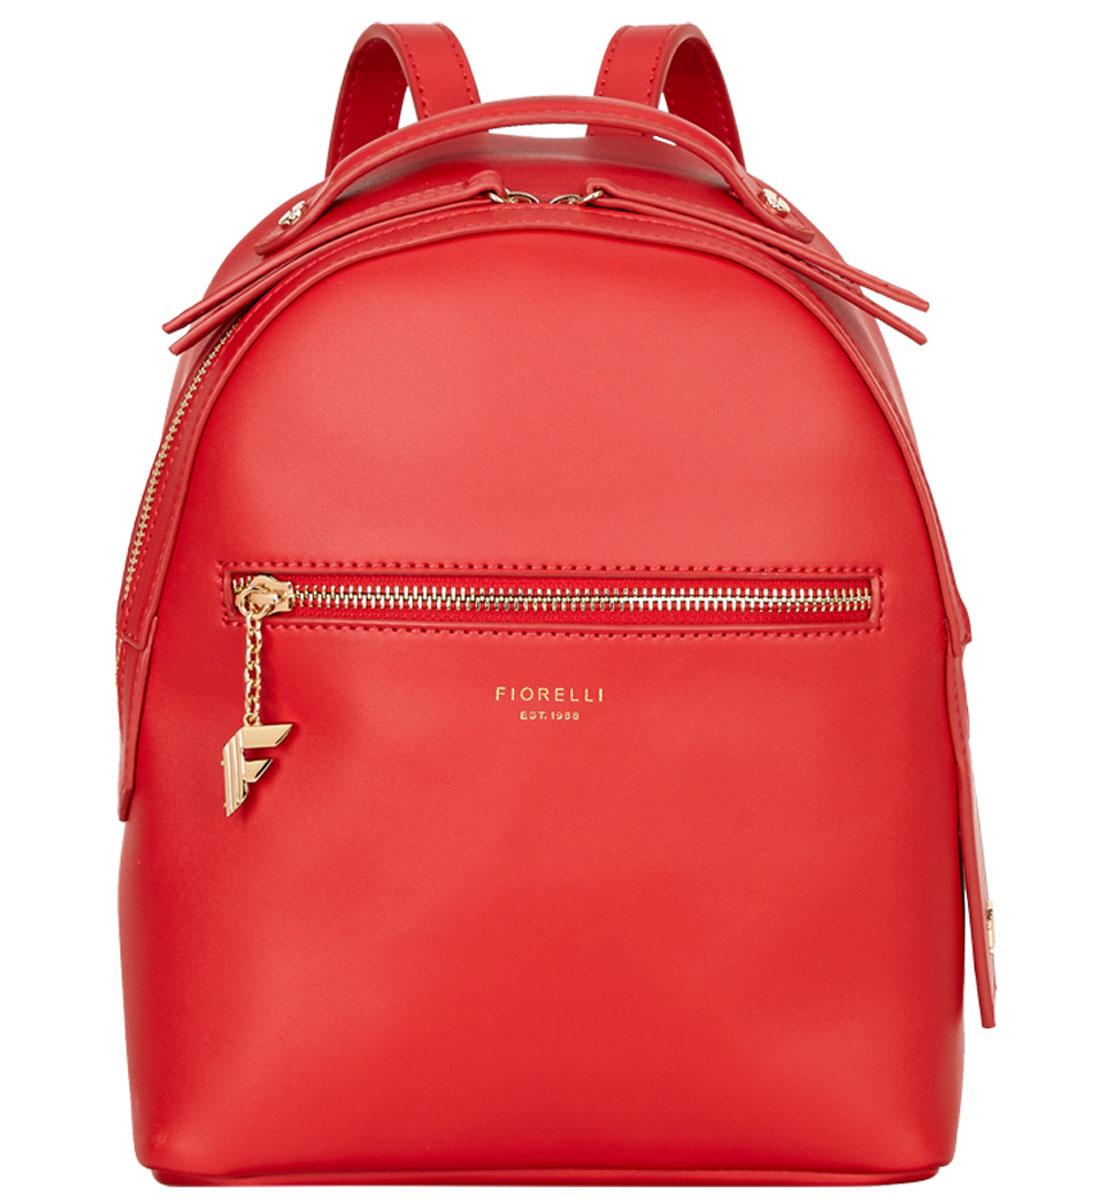 Рюкзак женский Fiorelli, цвет: красный. 8690 FH Pillarboxred8690 FH Pillarboxred